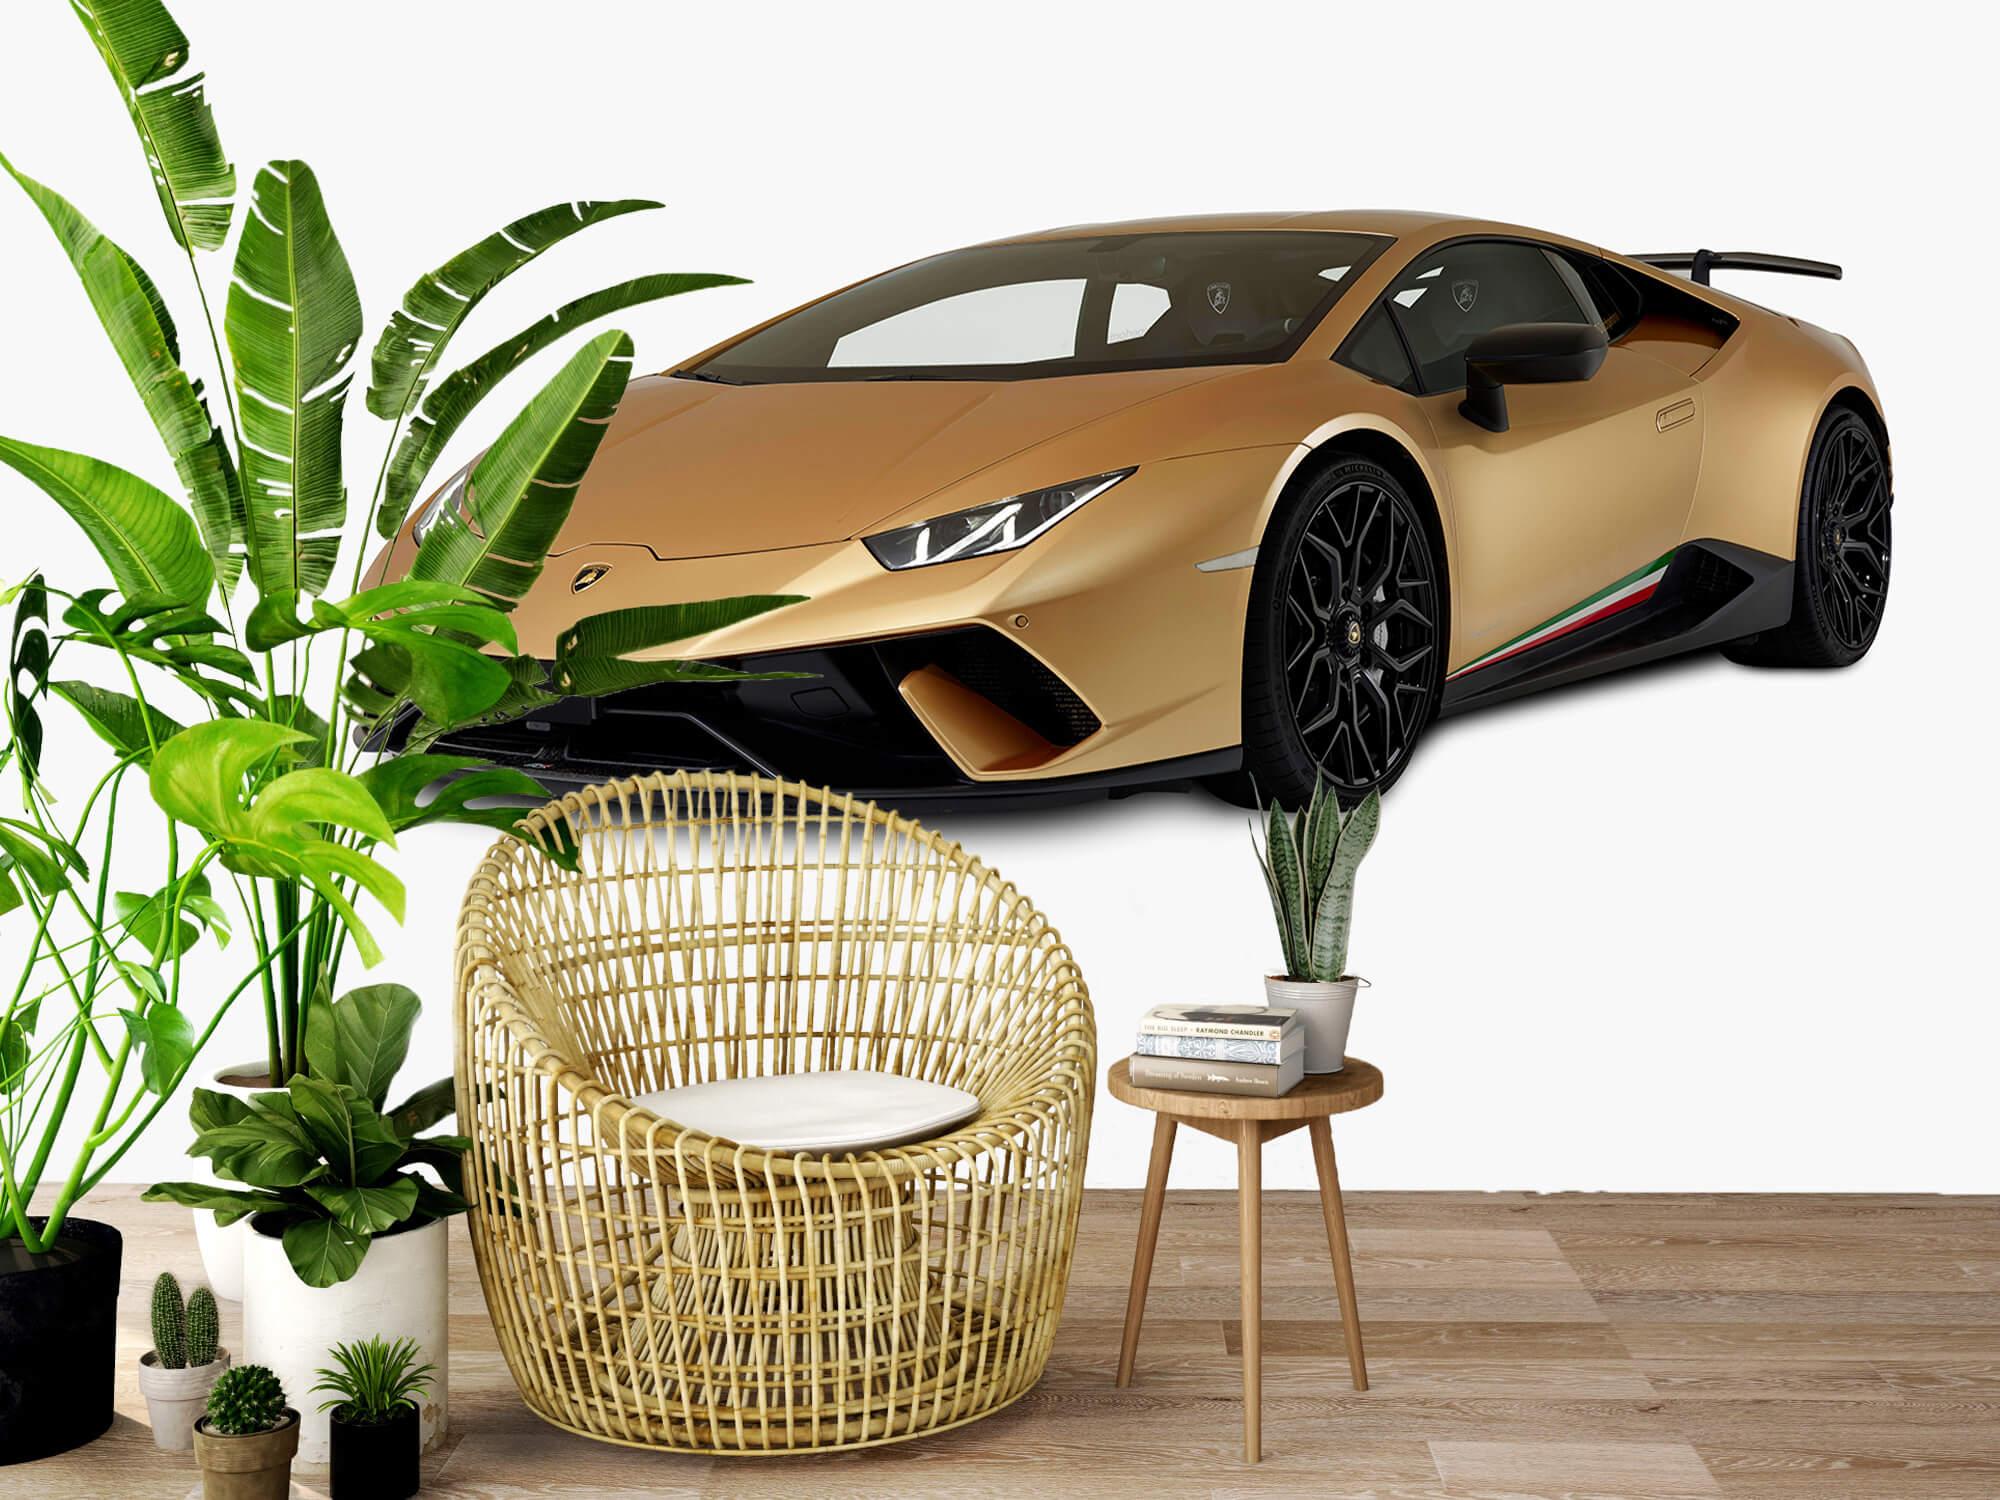 Wallpaper Lamborghini Huracán - Rechter voorkant wit 4